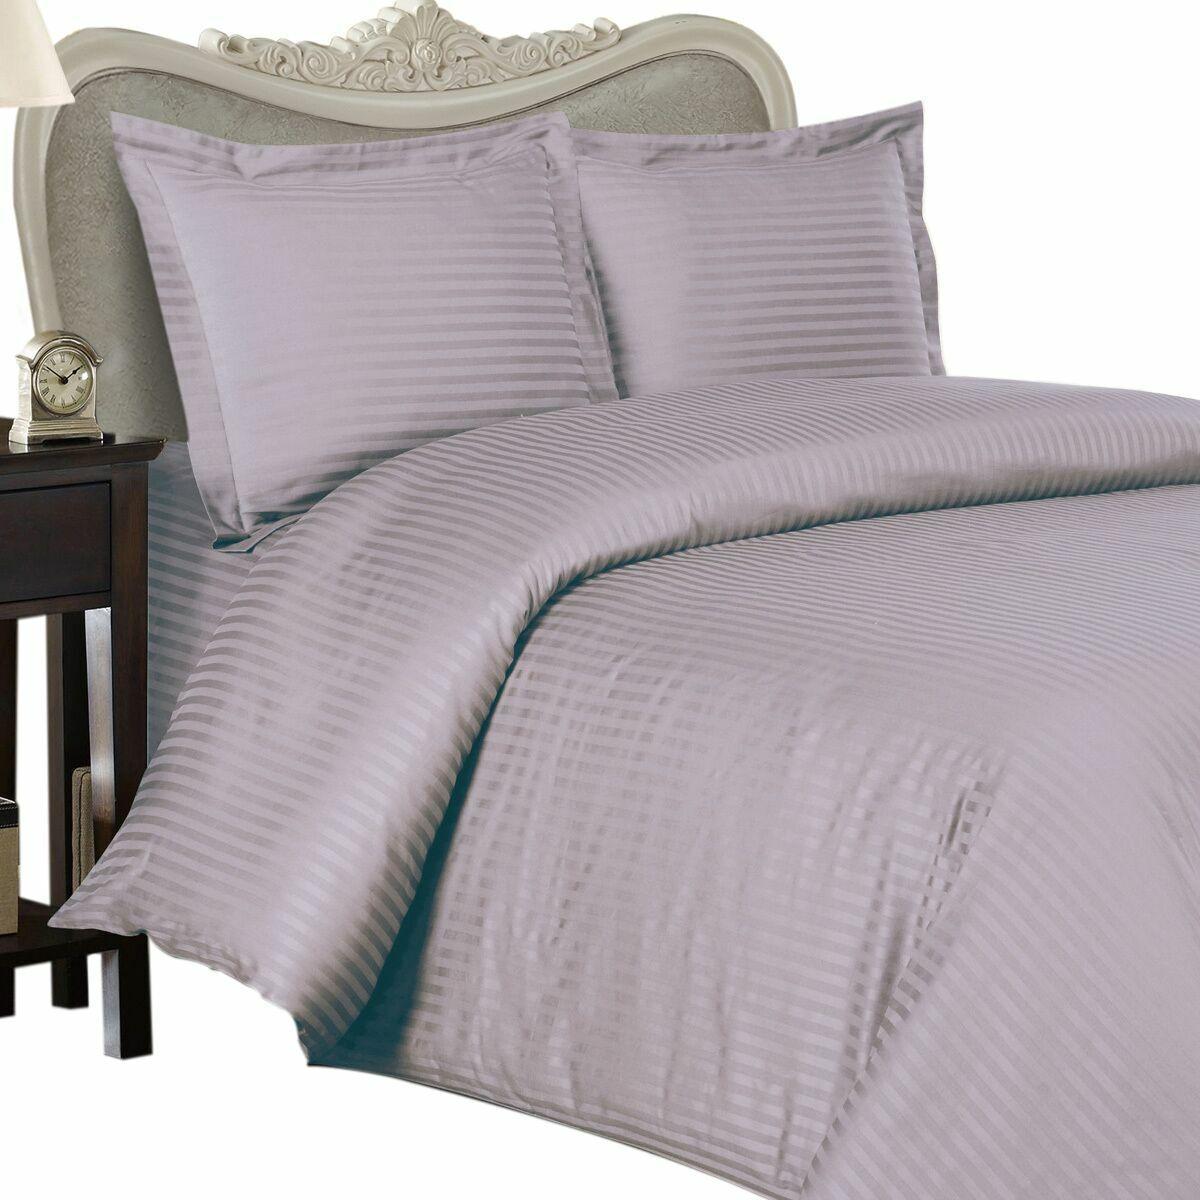 1000 Thread Count 100% Egyptian Cotton Sheet Set 1000 TC TWIN Lavender Stripe